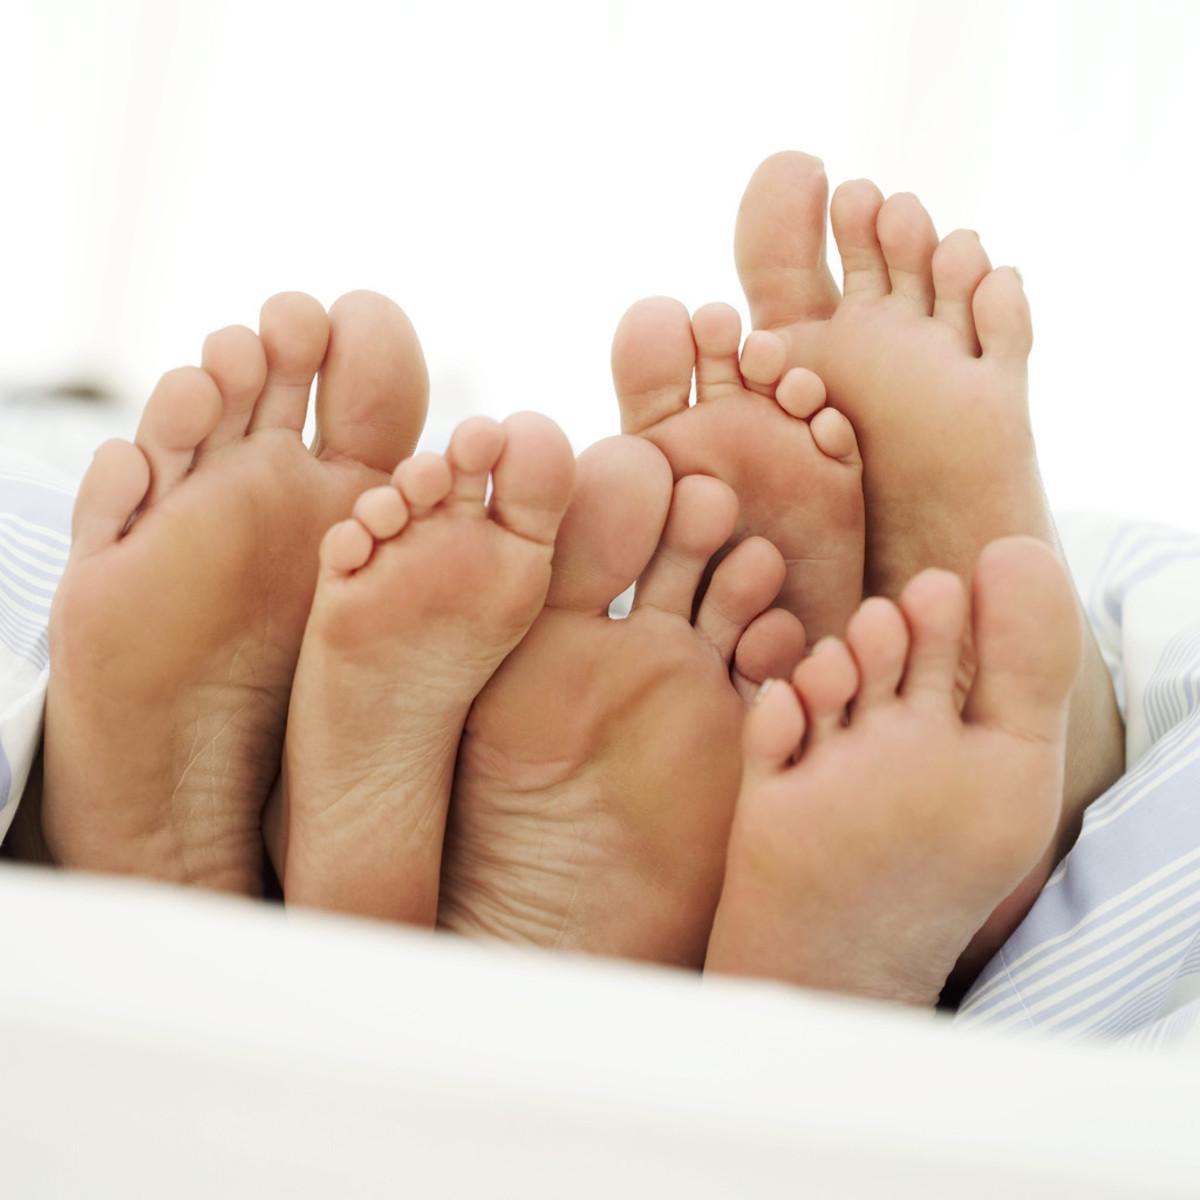 O, be careful little feet where you go!